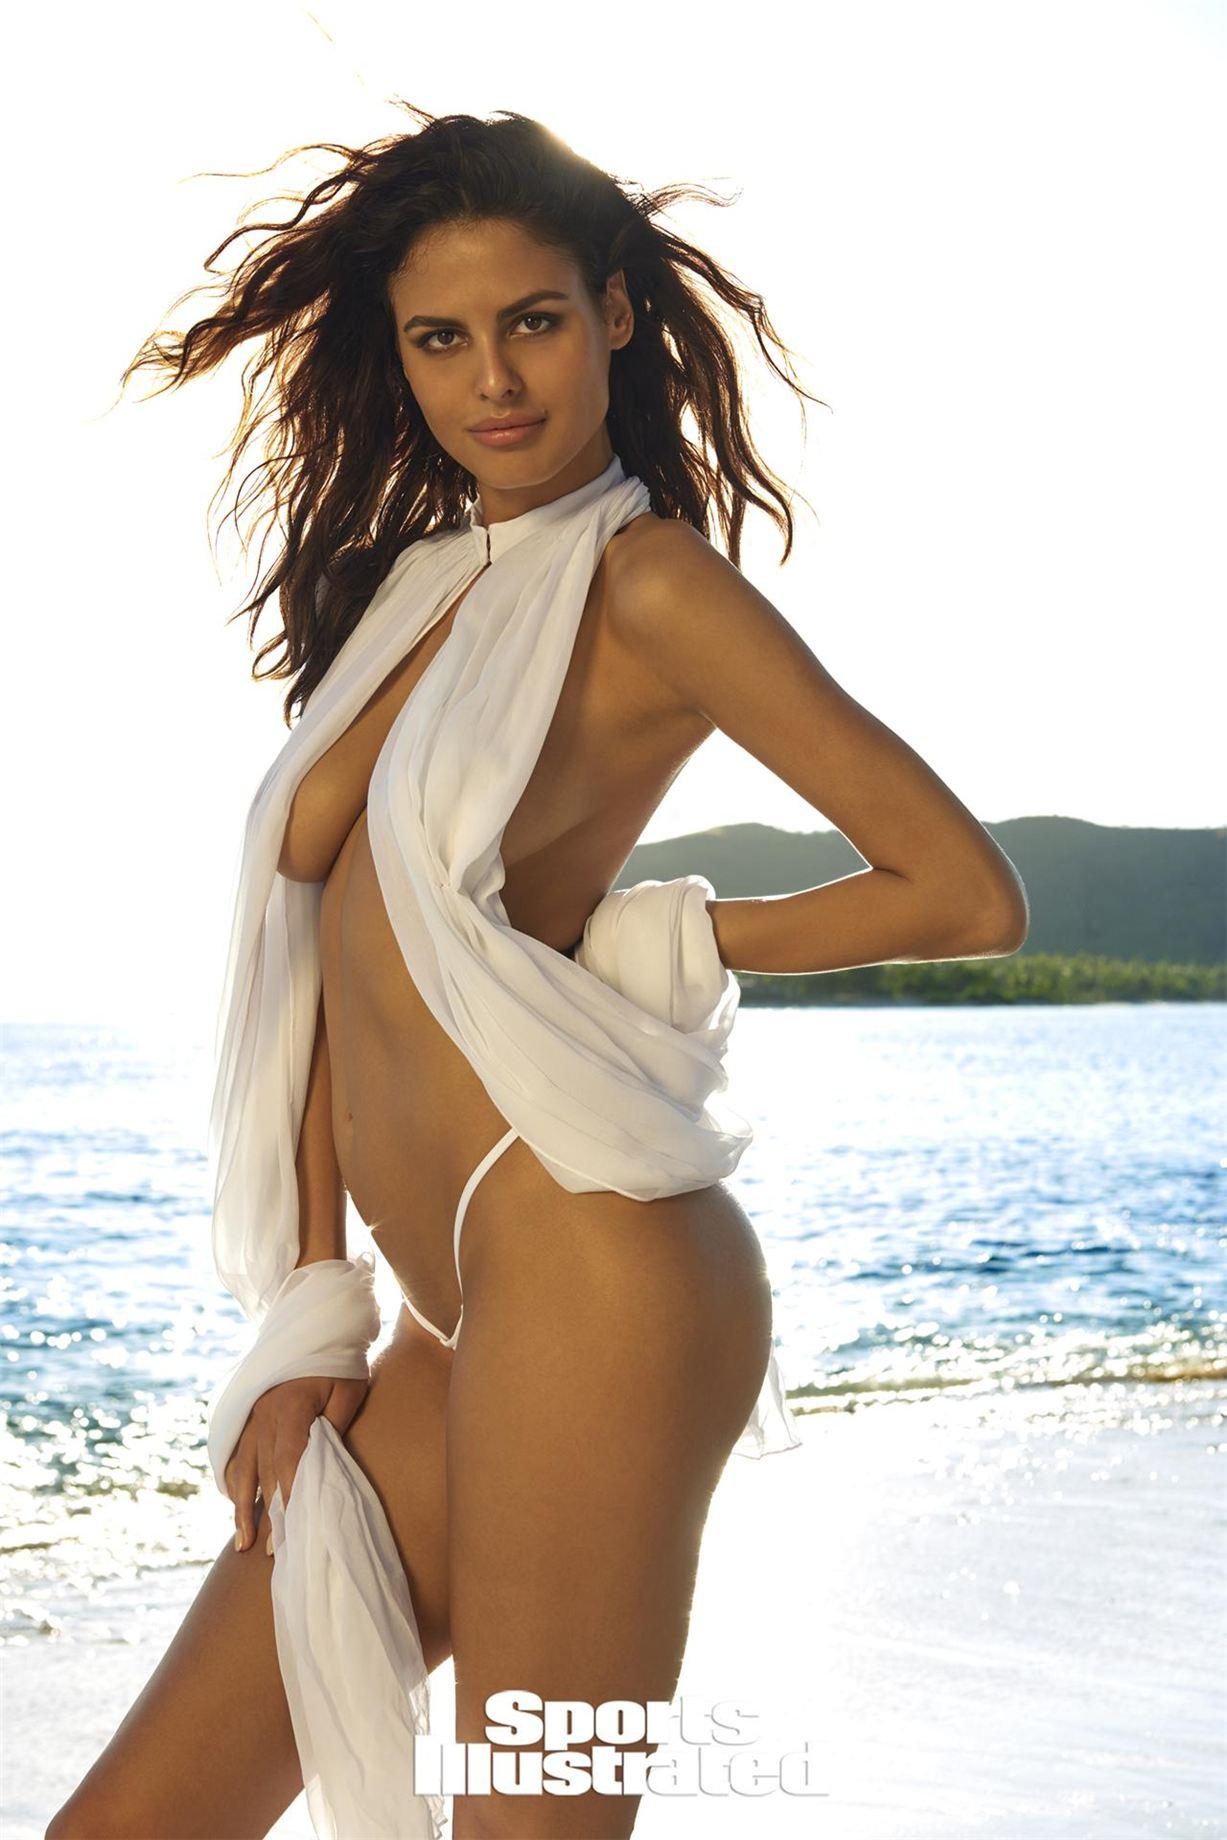 Bojana Krsmanovic / Бояна Крсманович в купальниках из новой коллекции Sports Illustrated Swimsuit 2017 issue / in Fiji by Yu Tsai